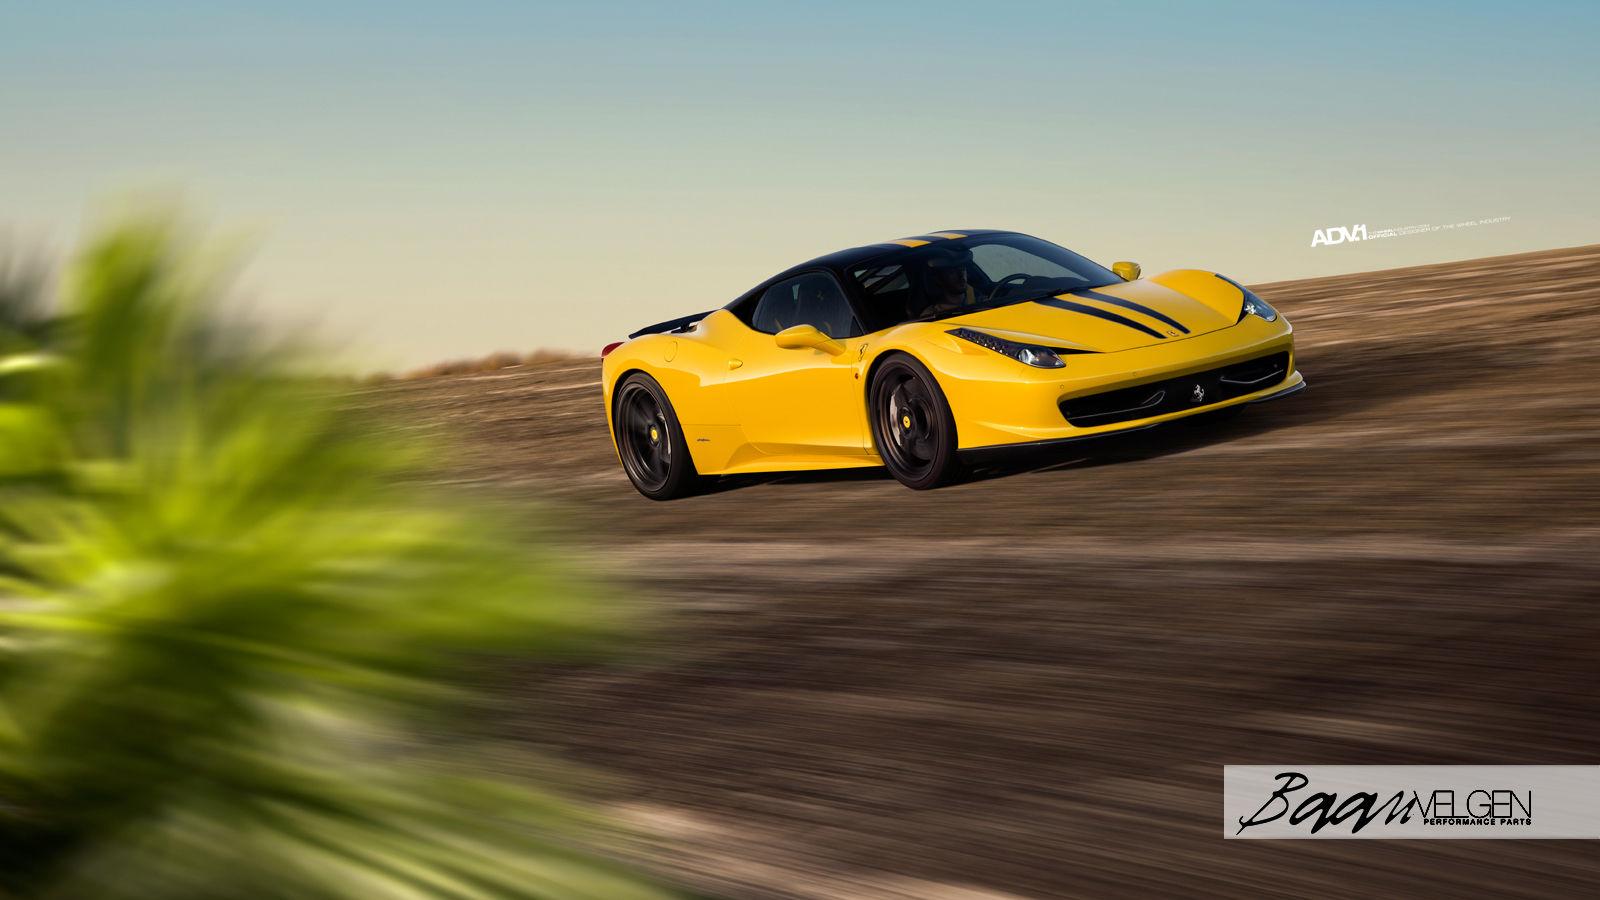 2015 Ferrari 458 Italia   ADV.1 Ferrari 458 Italia